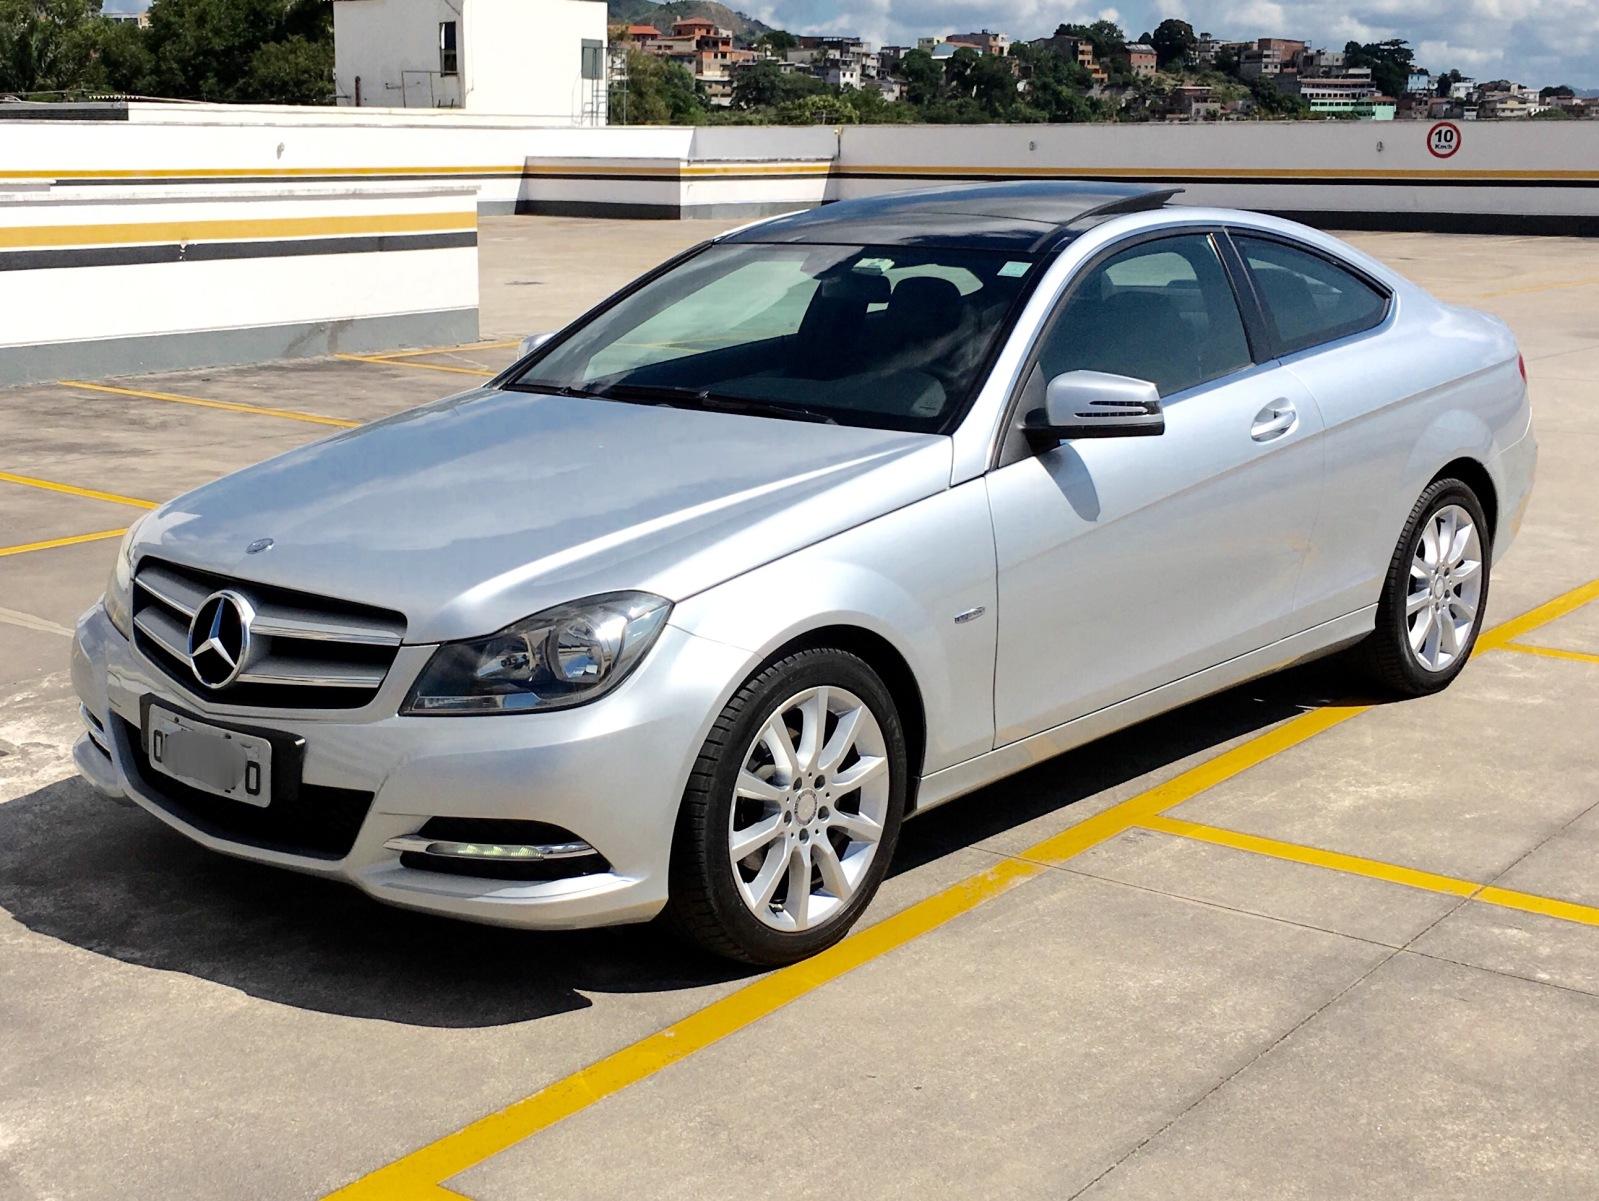 C180 - (VENDO): C204 - C180 coupé 11/12 - R$68.000,00 2rotkcw